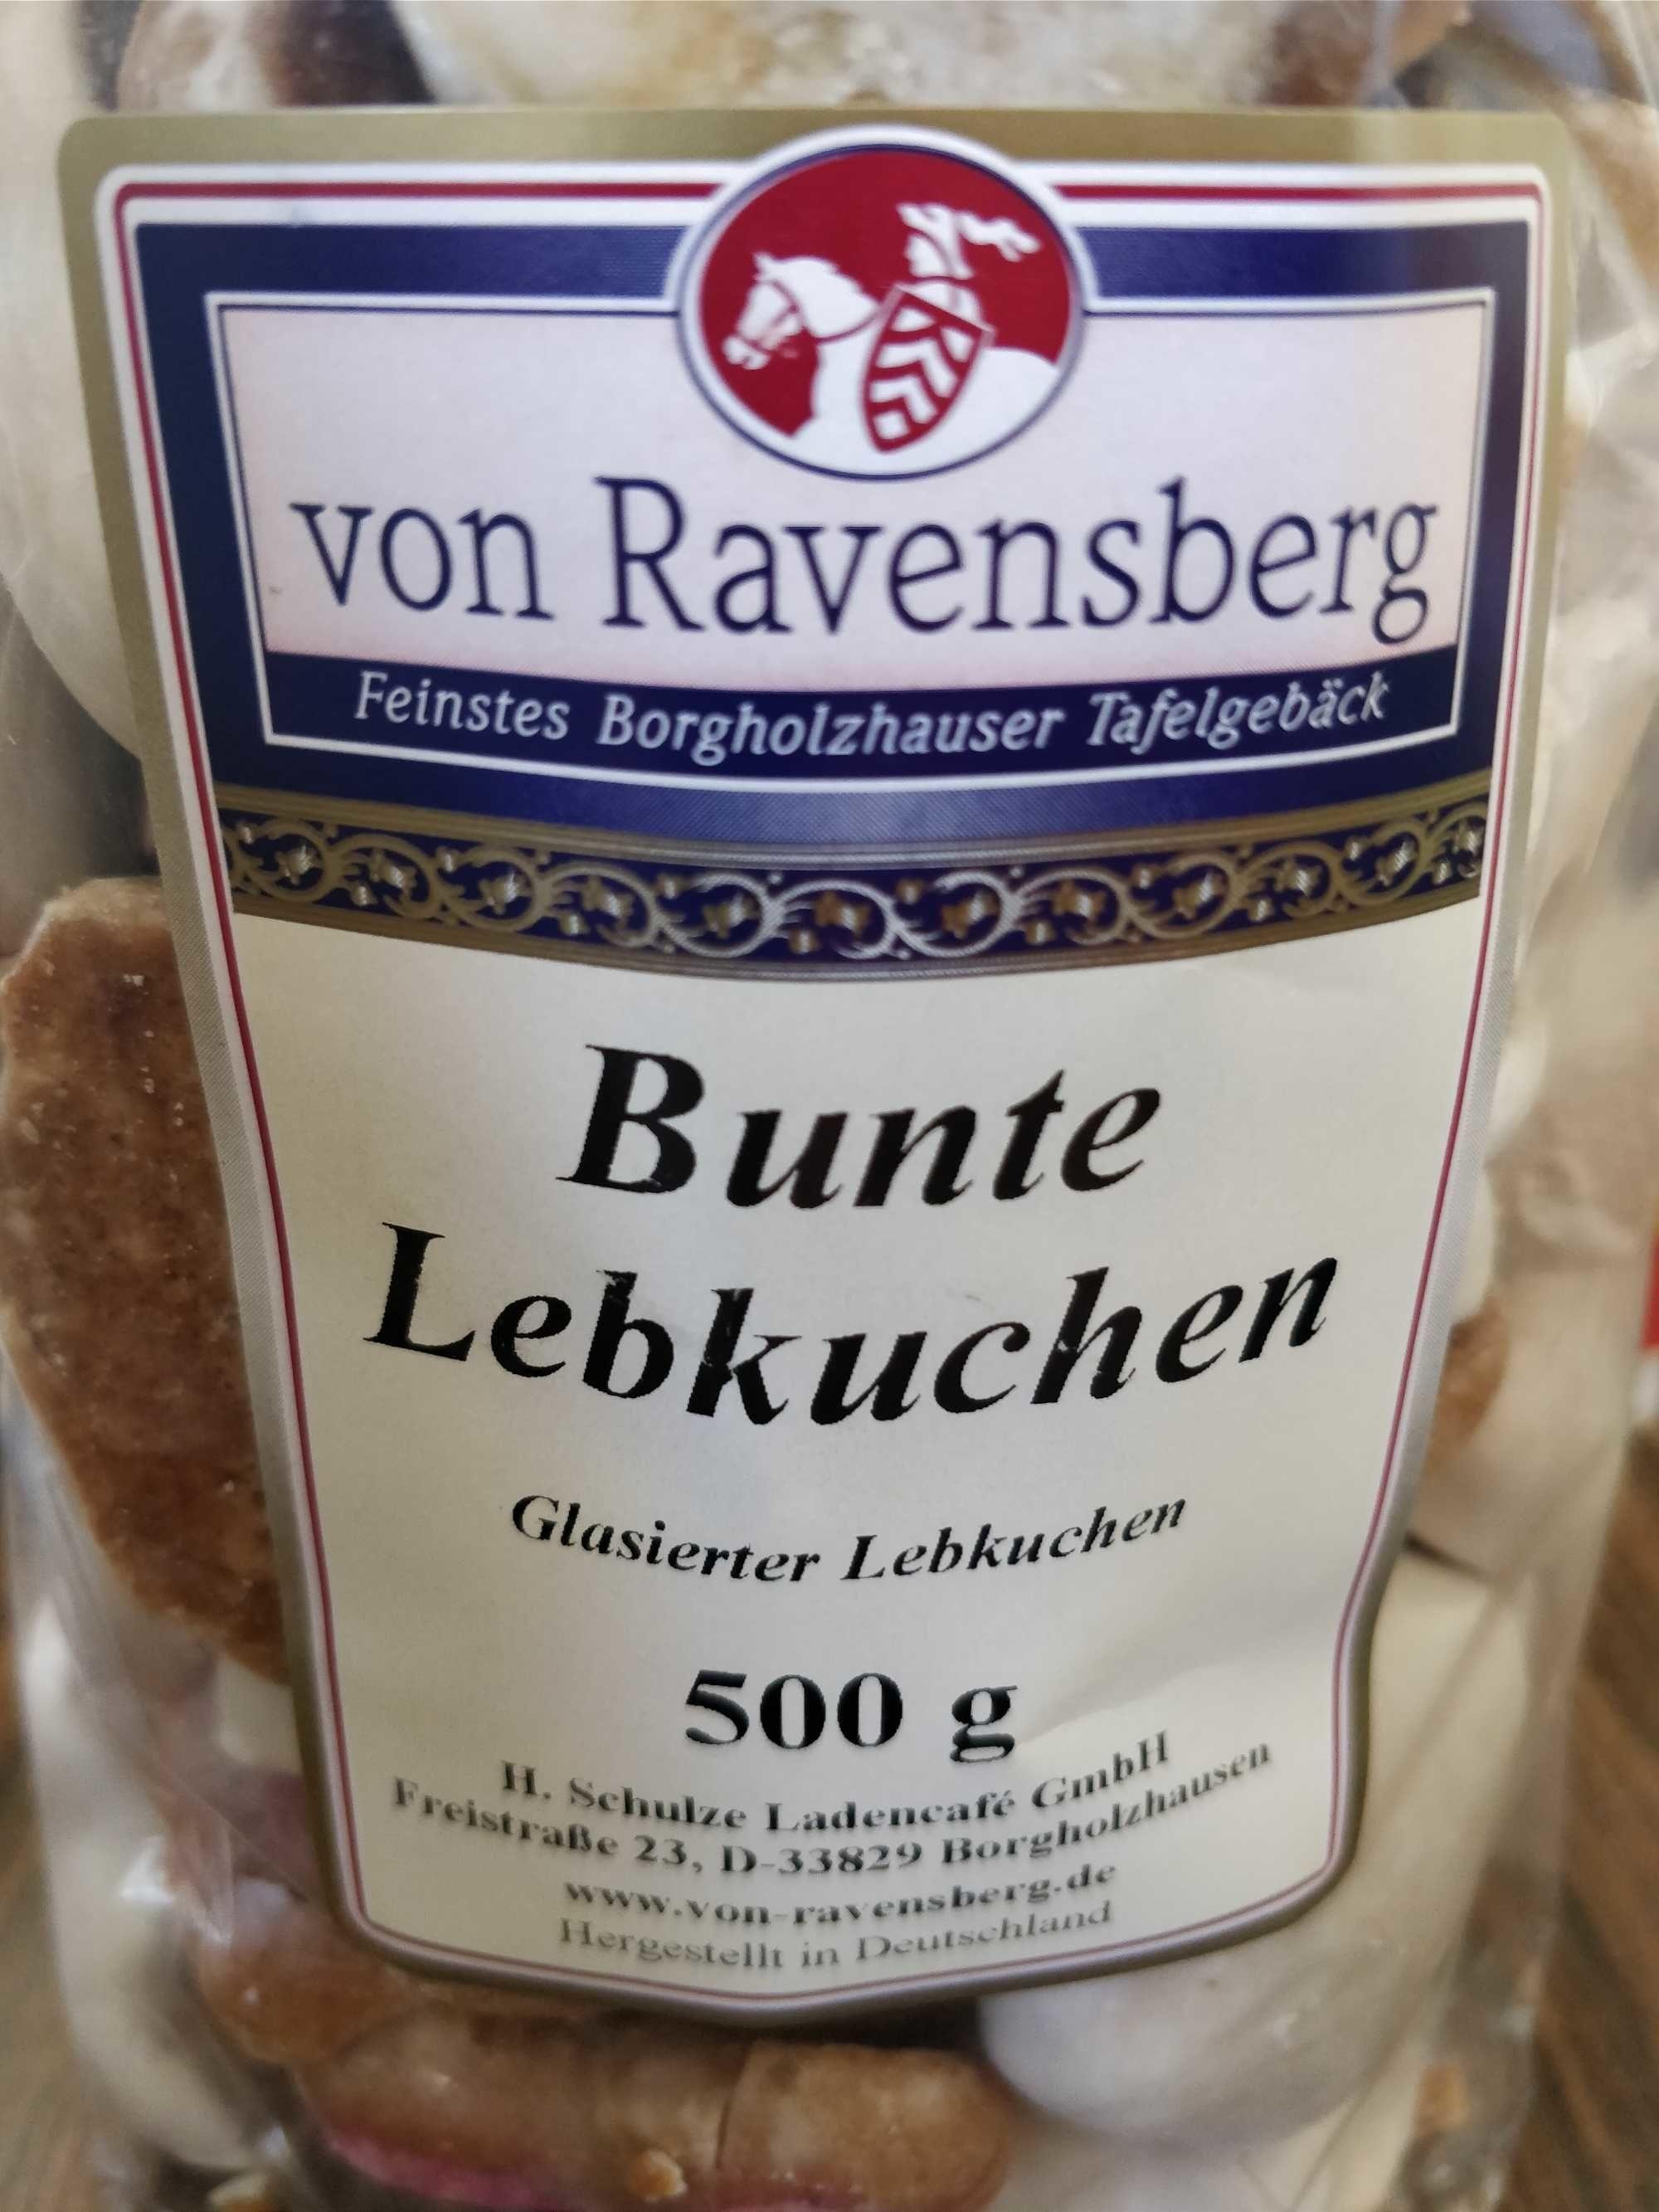 Bunte Lebkuchen - Product